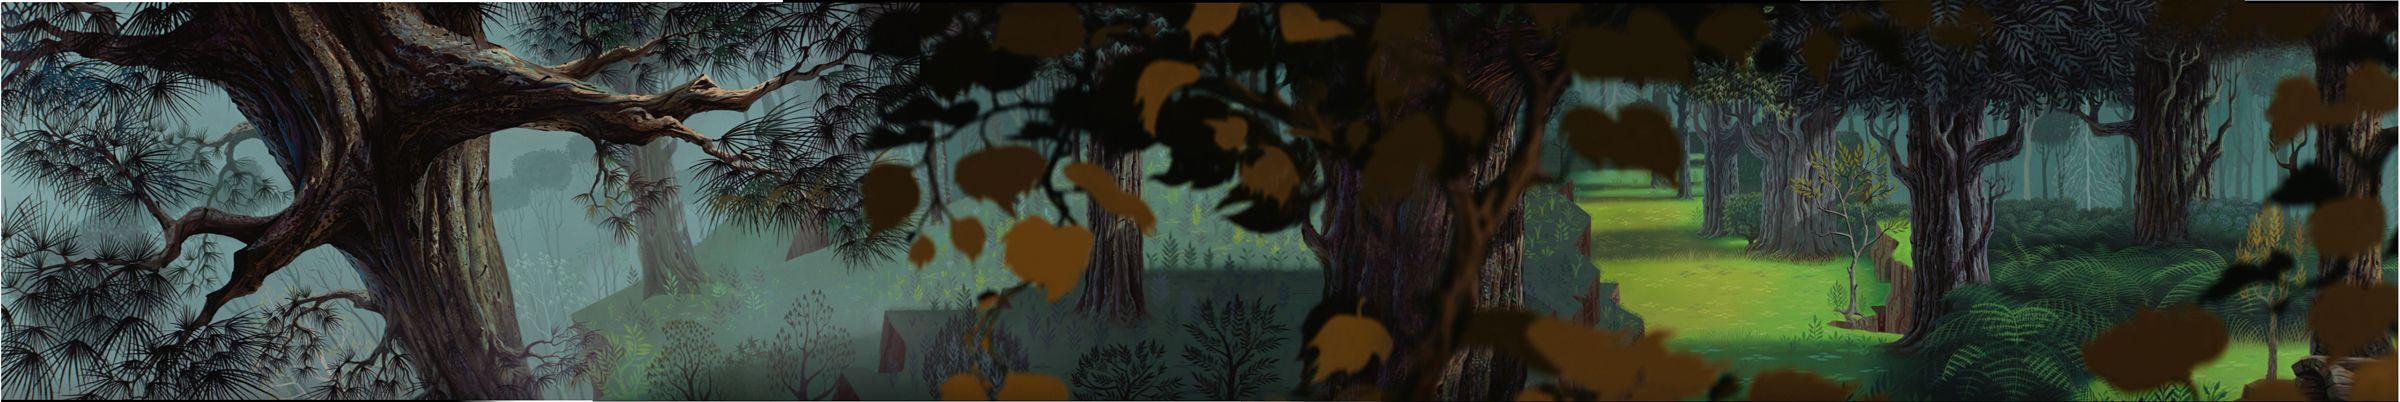 sleeping-beauty-pan-forest-b.jpg (2400×402)